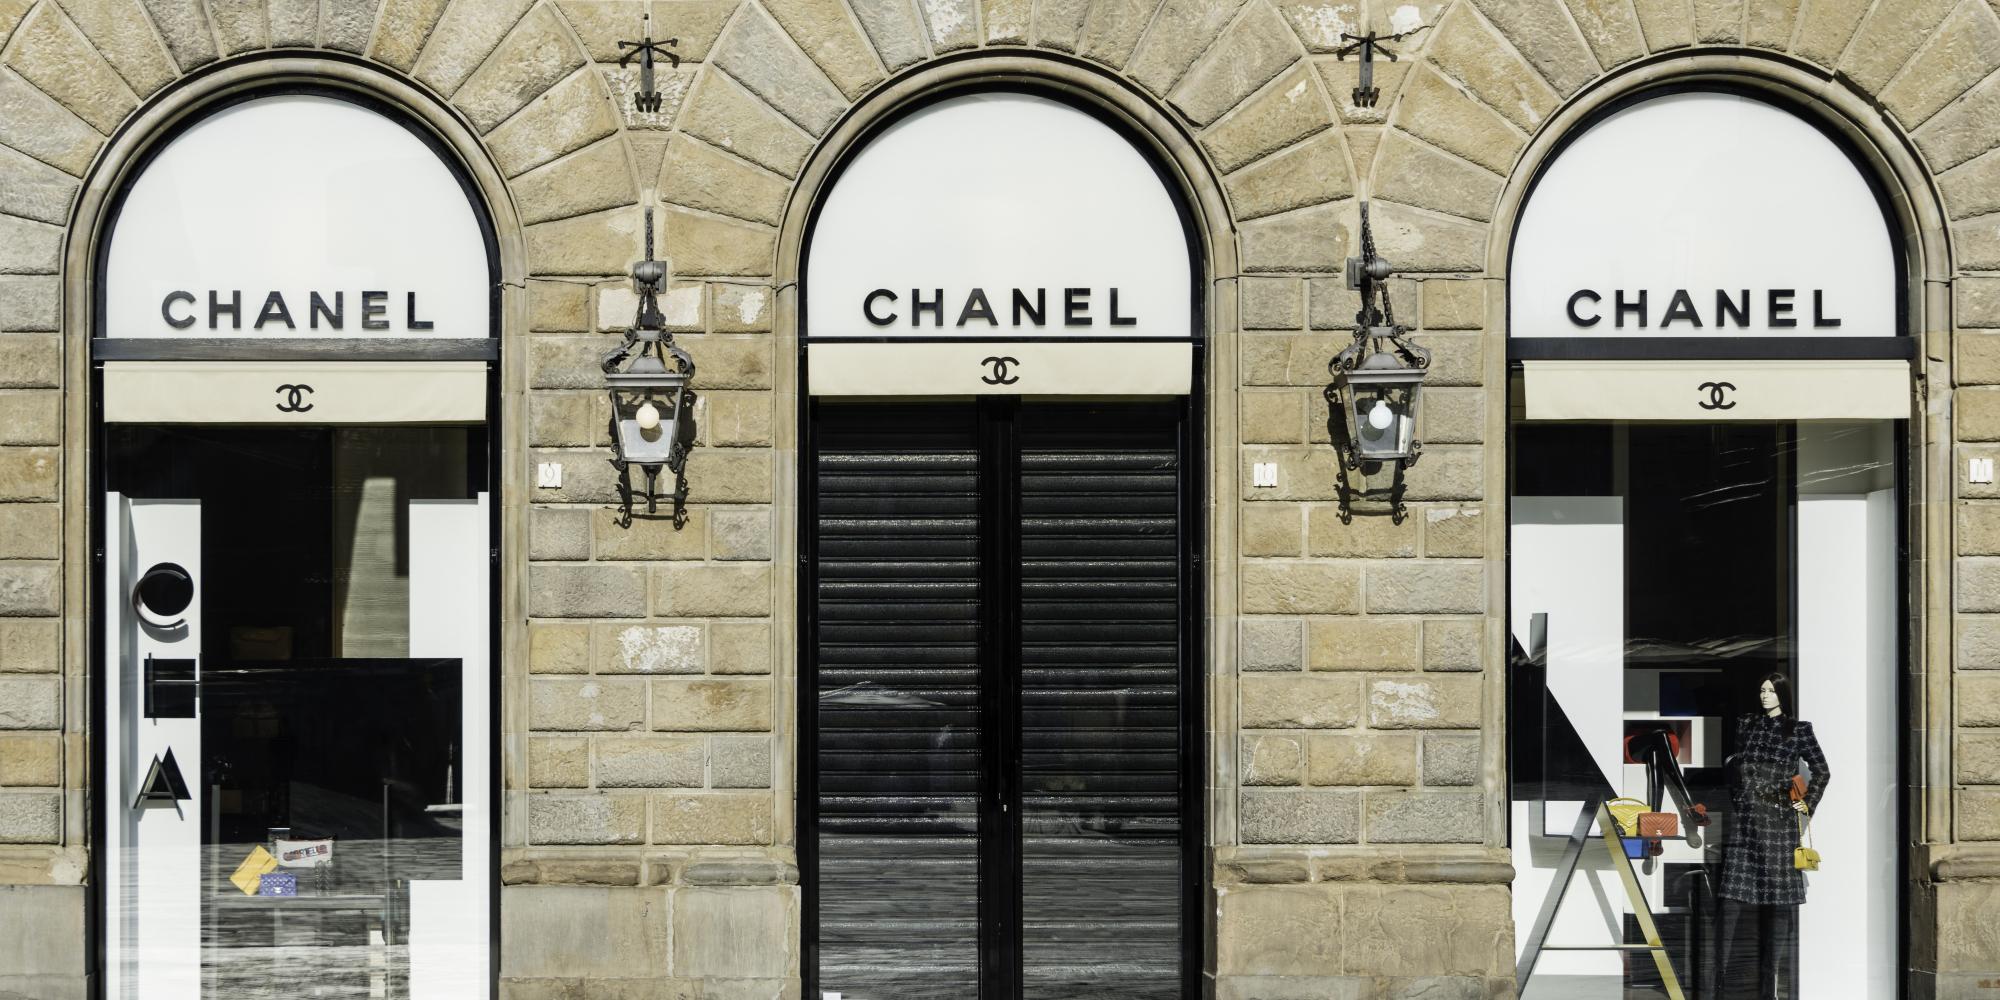 95f27e52a8f34 Libya News - أخبار ليبيا - أغلى 10 ماركات أزياء في العالم.. أغلبها  إيطالية.. تعرَّف على قصص أصحابها وقيمة ربحهم